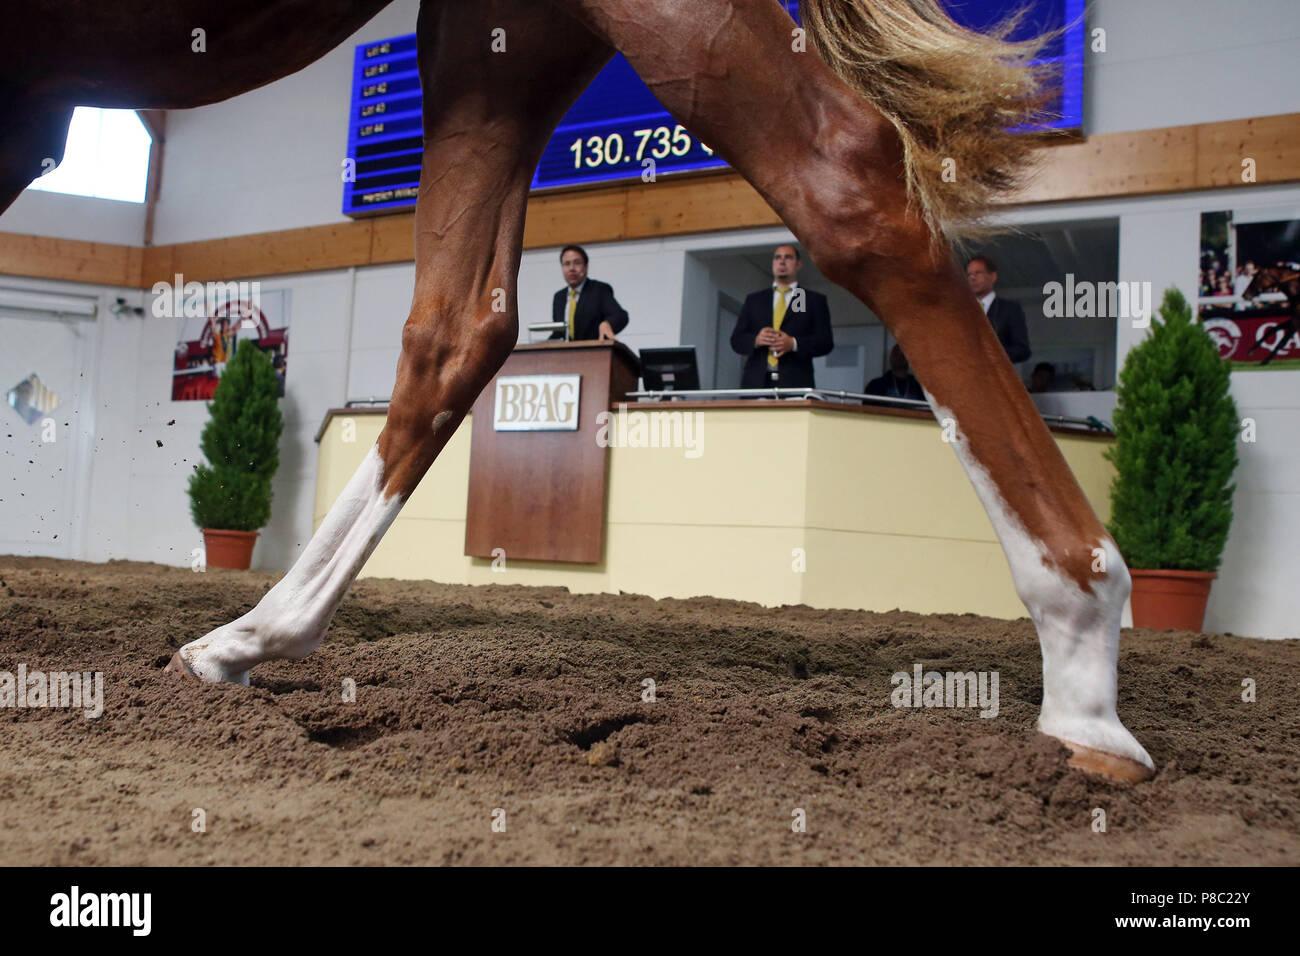 Iffezheim, symbol photo, horse auction - Stock Image